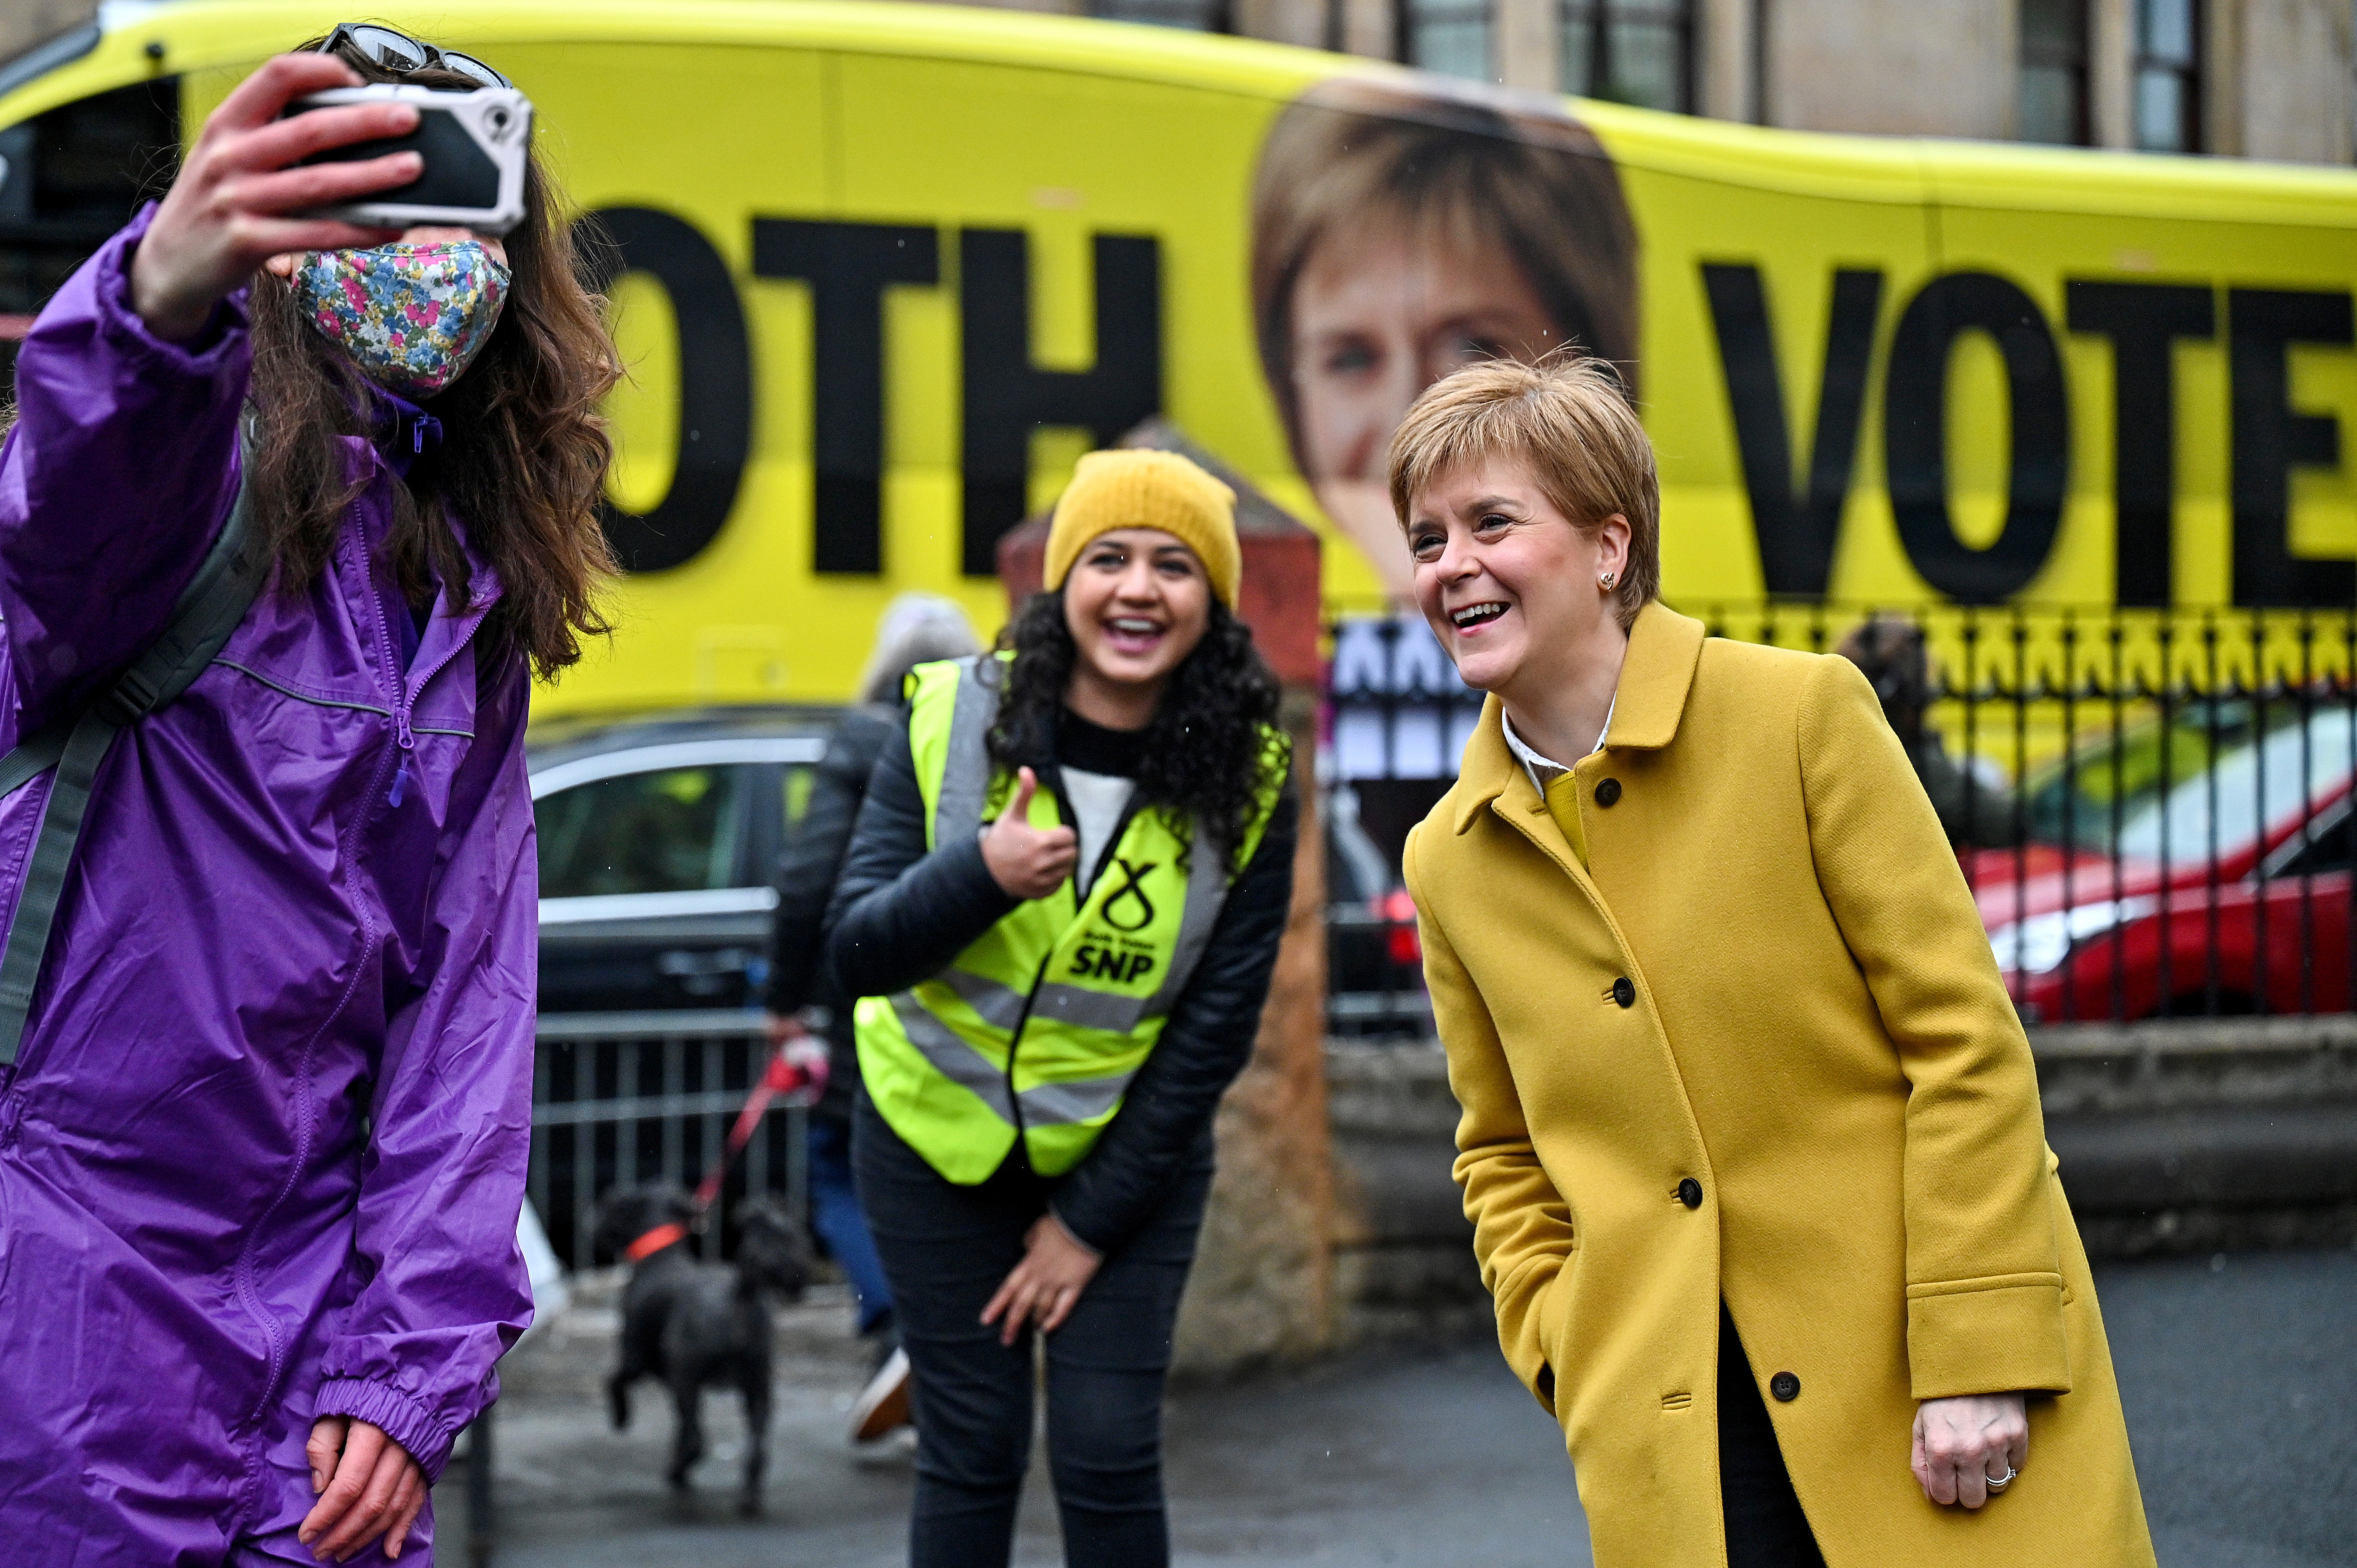 'Selfie' de Nicola Sturgeon y la candidata Roza Salih, en Glasgow.